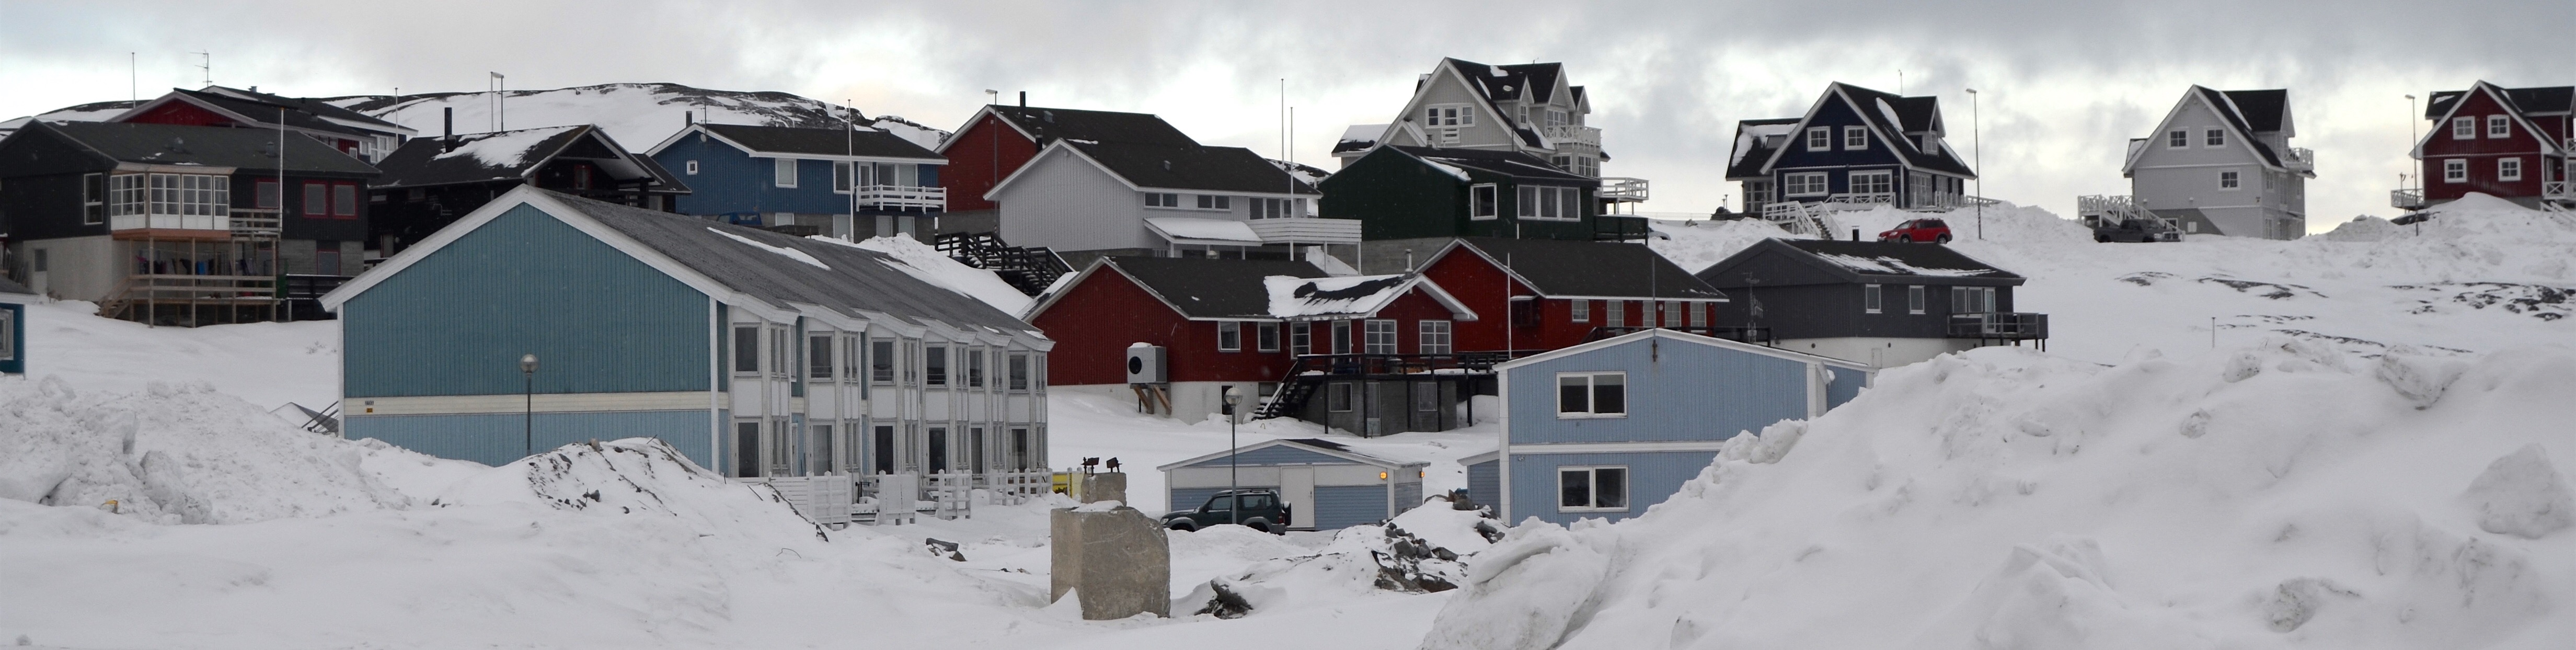 Dejlige Grønland